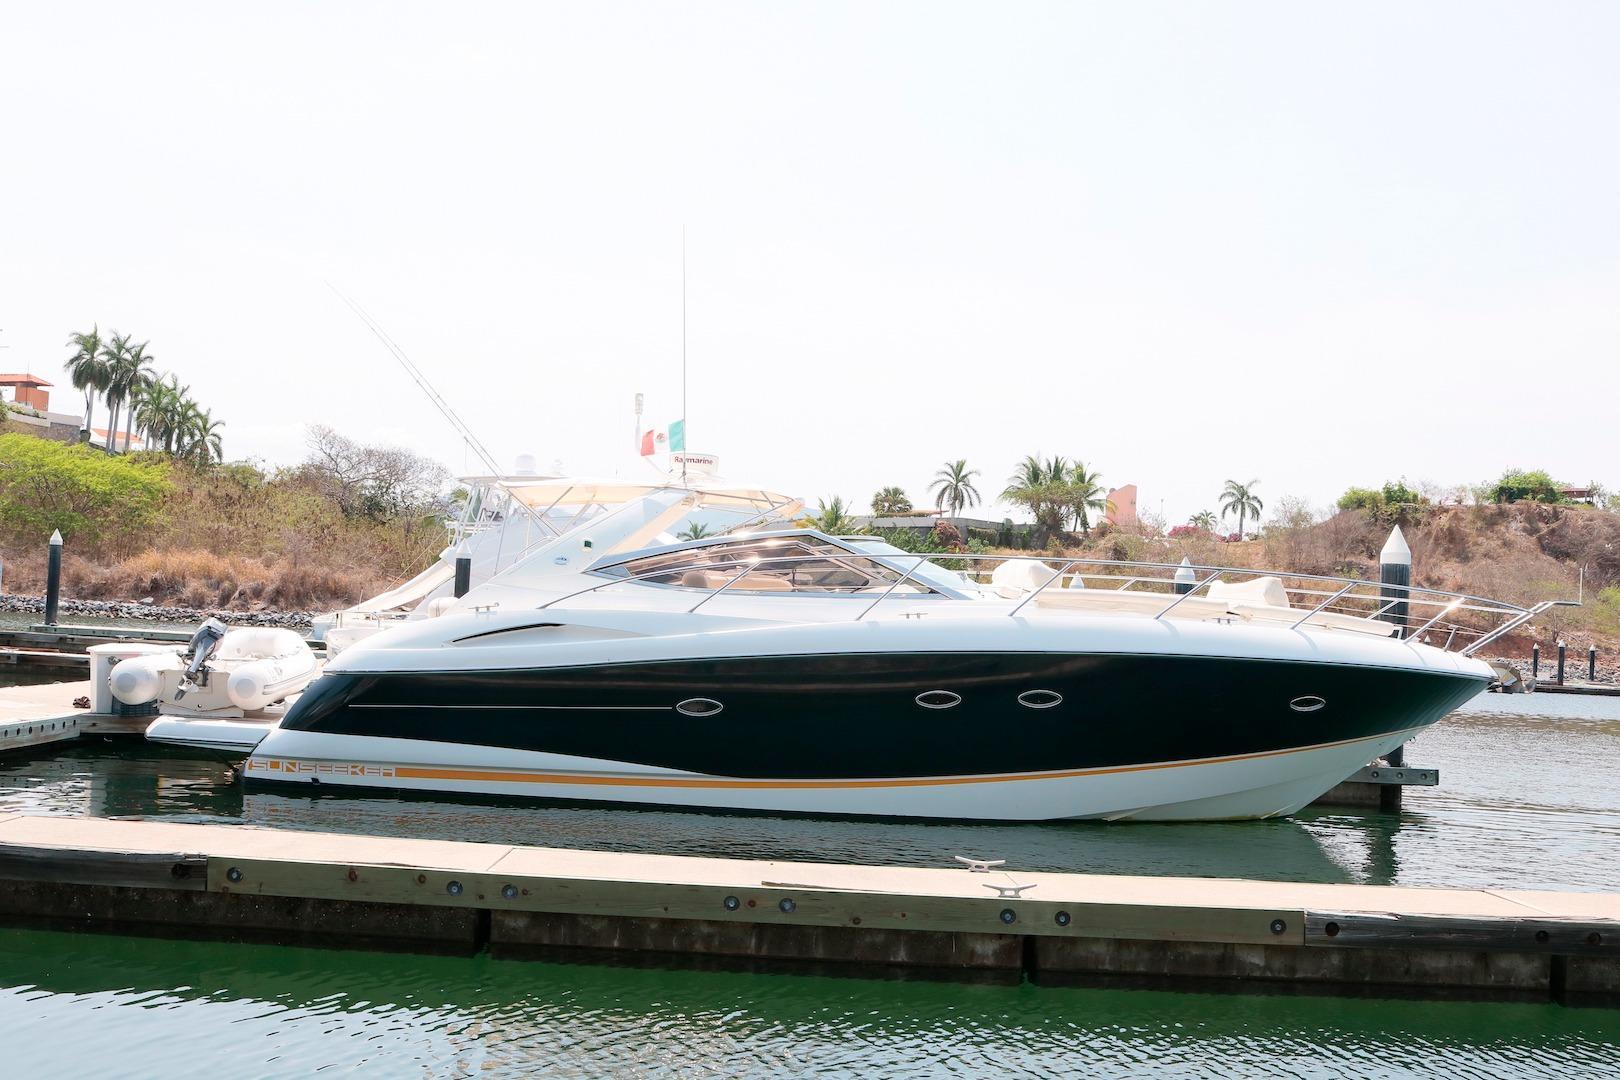 46 ft Sunseeker Portofino 46